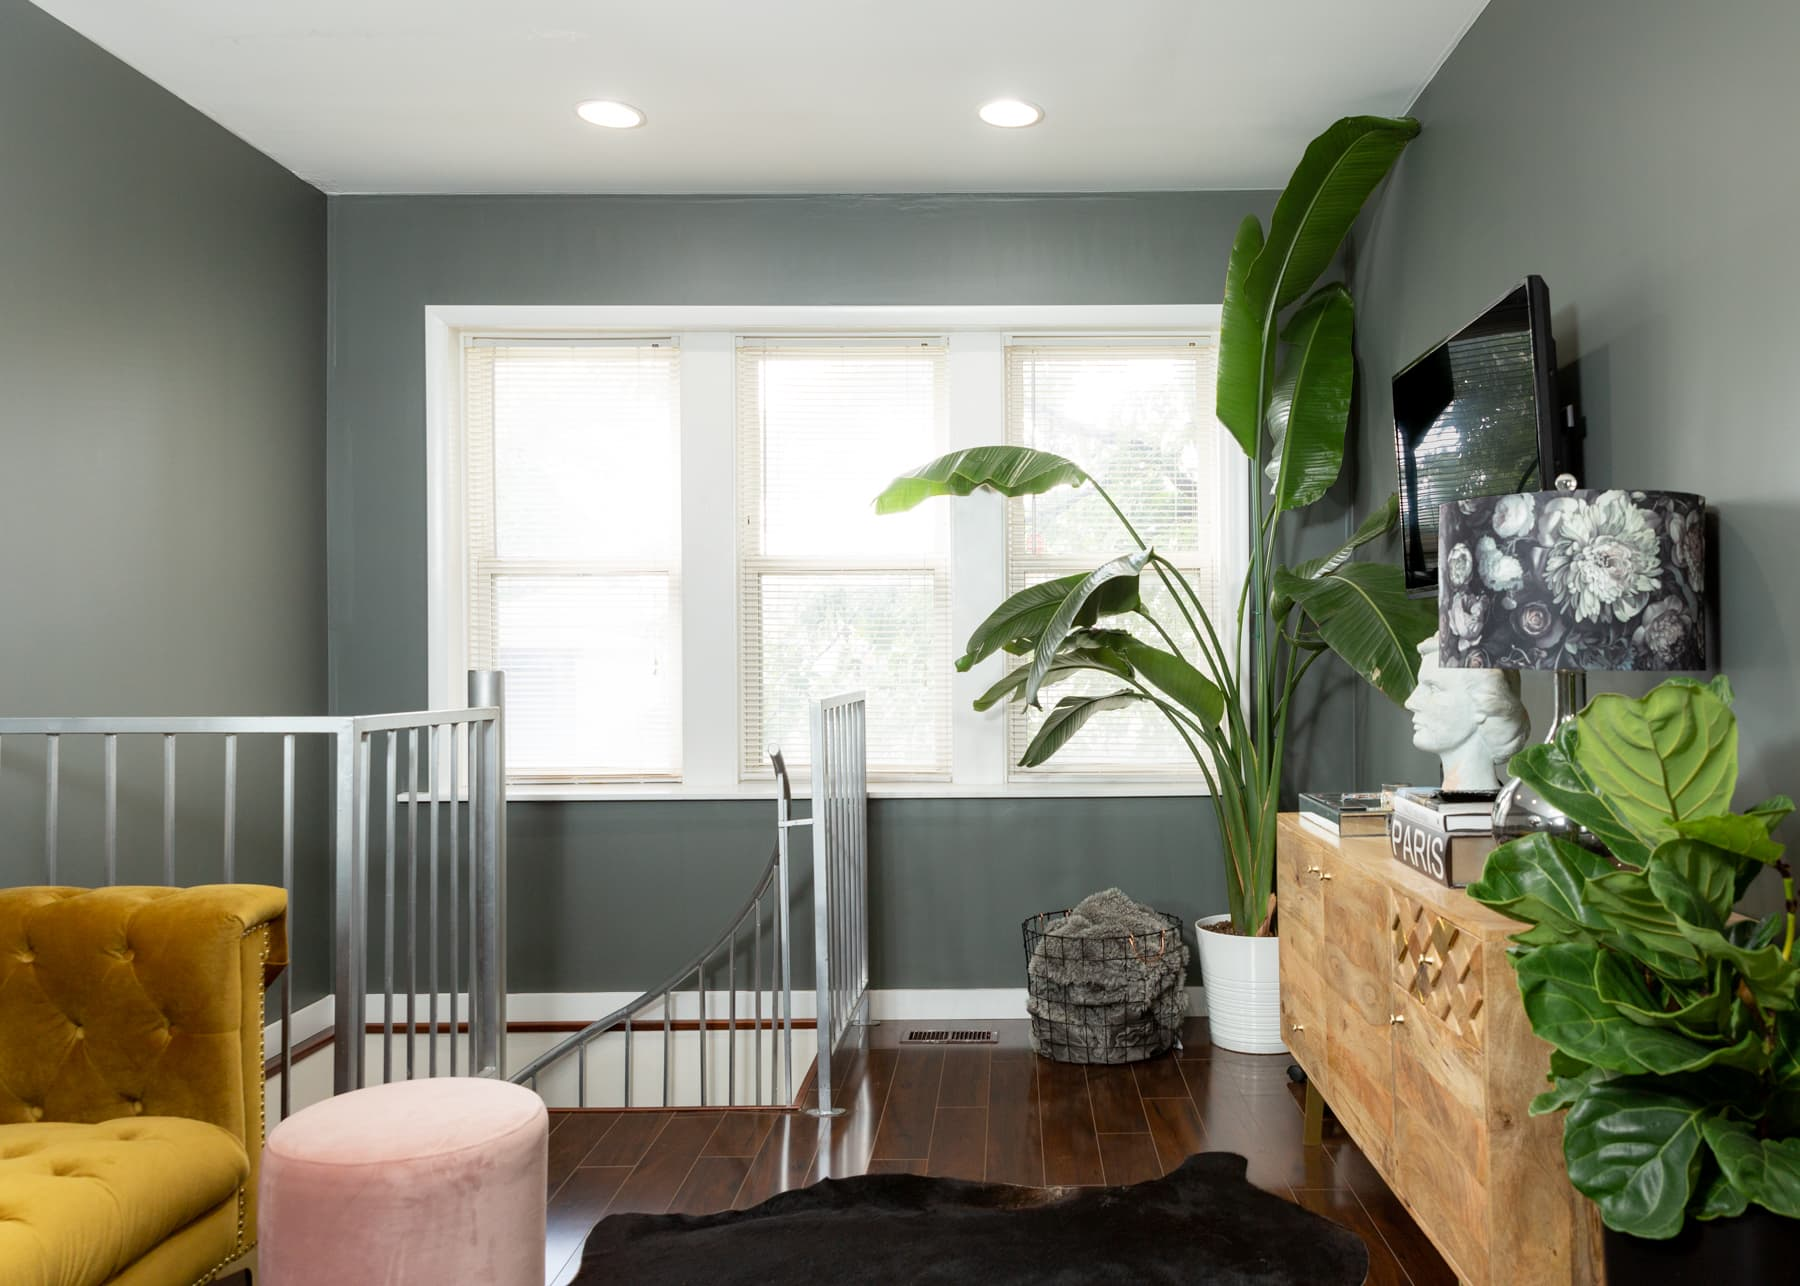 Signed Blake Gifford Chicago Apartment Photos | Apartment ...